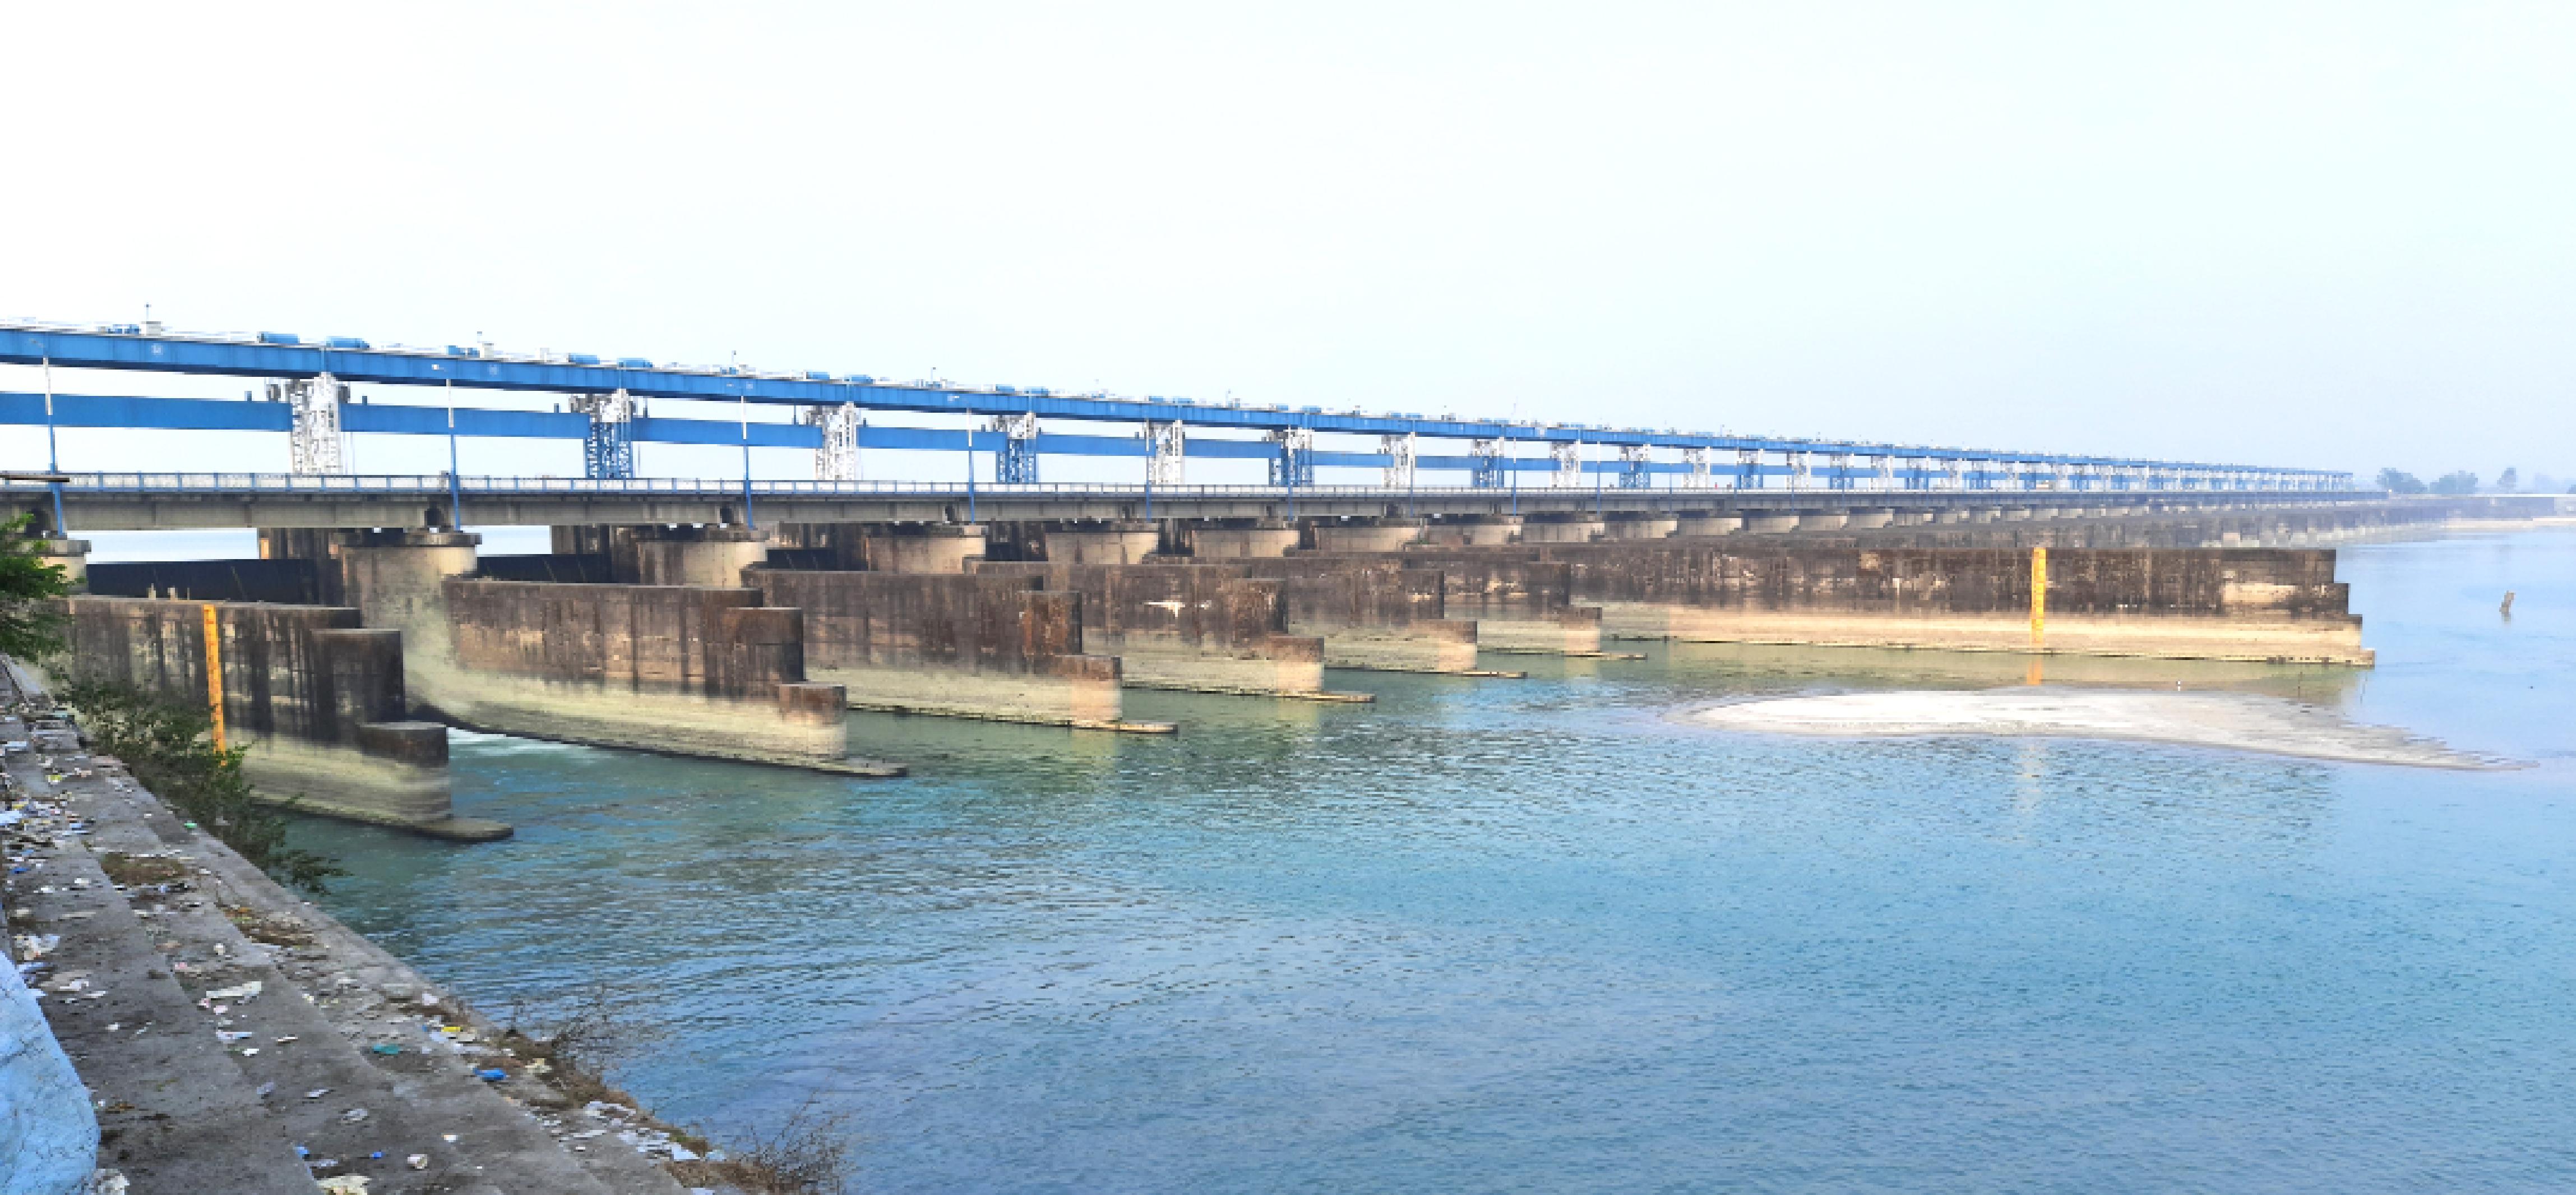 Tista river barrage